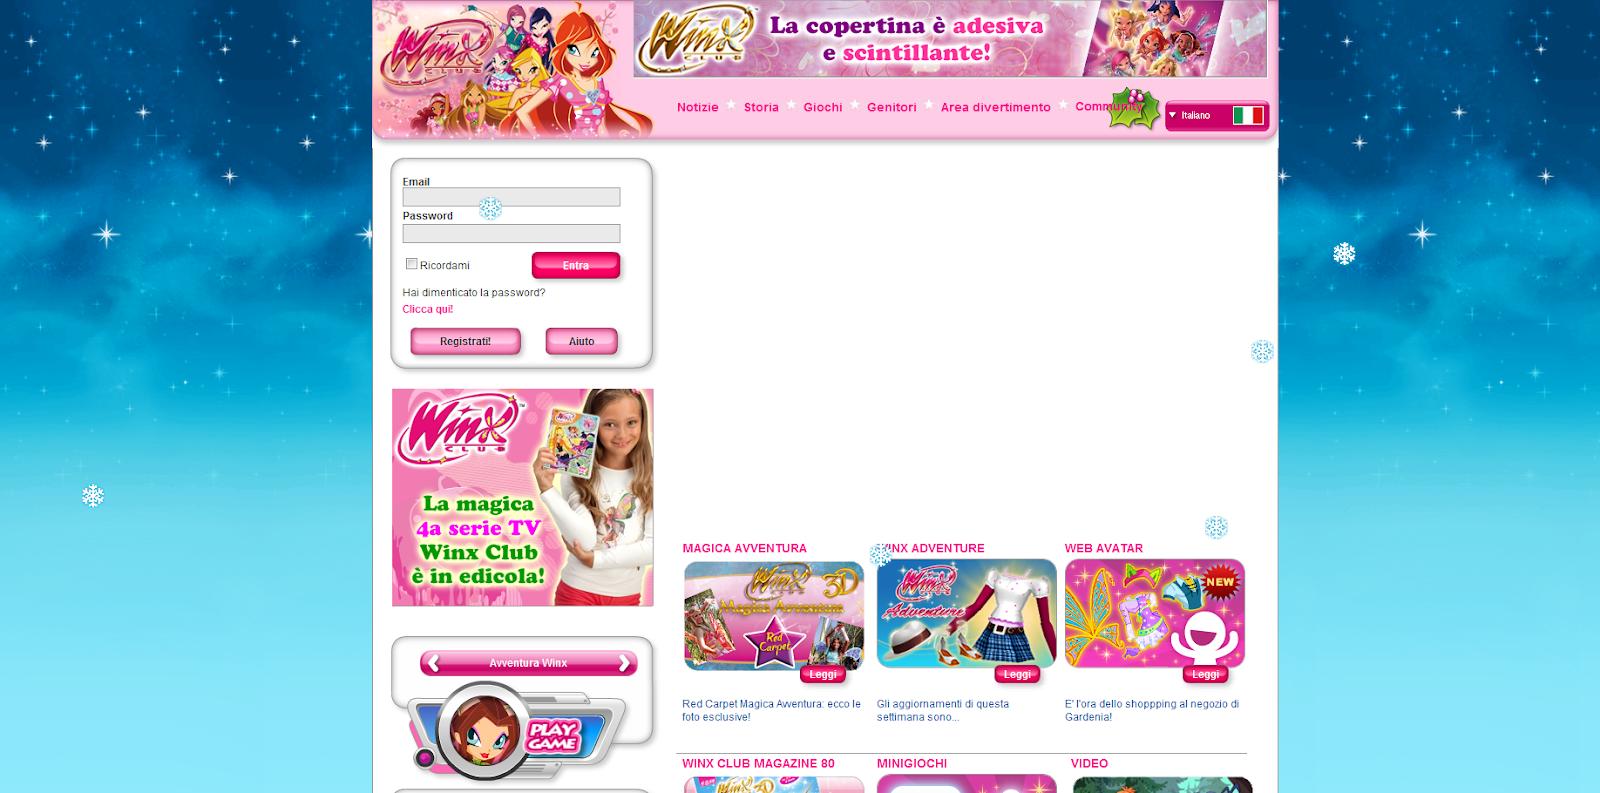 club web de